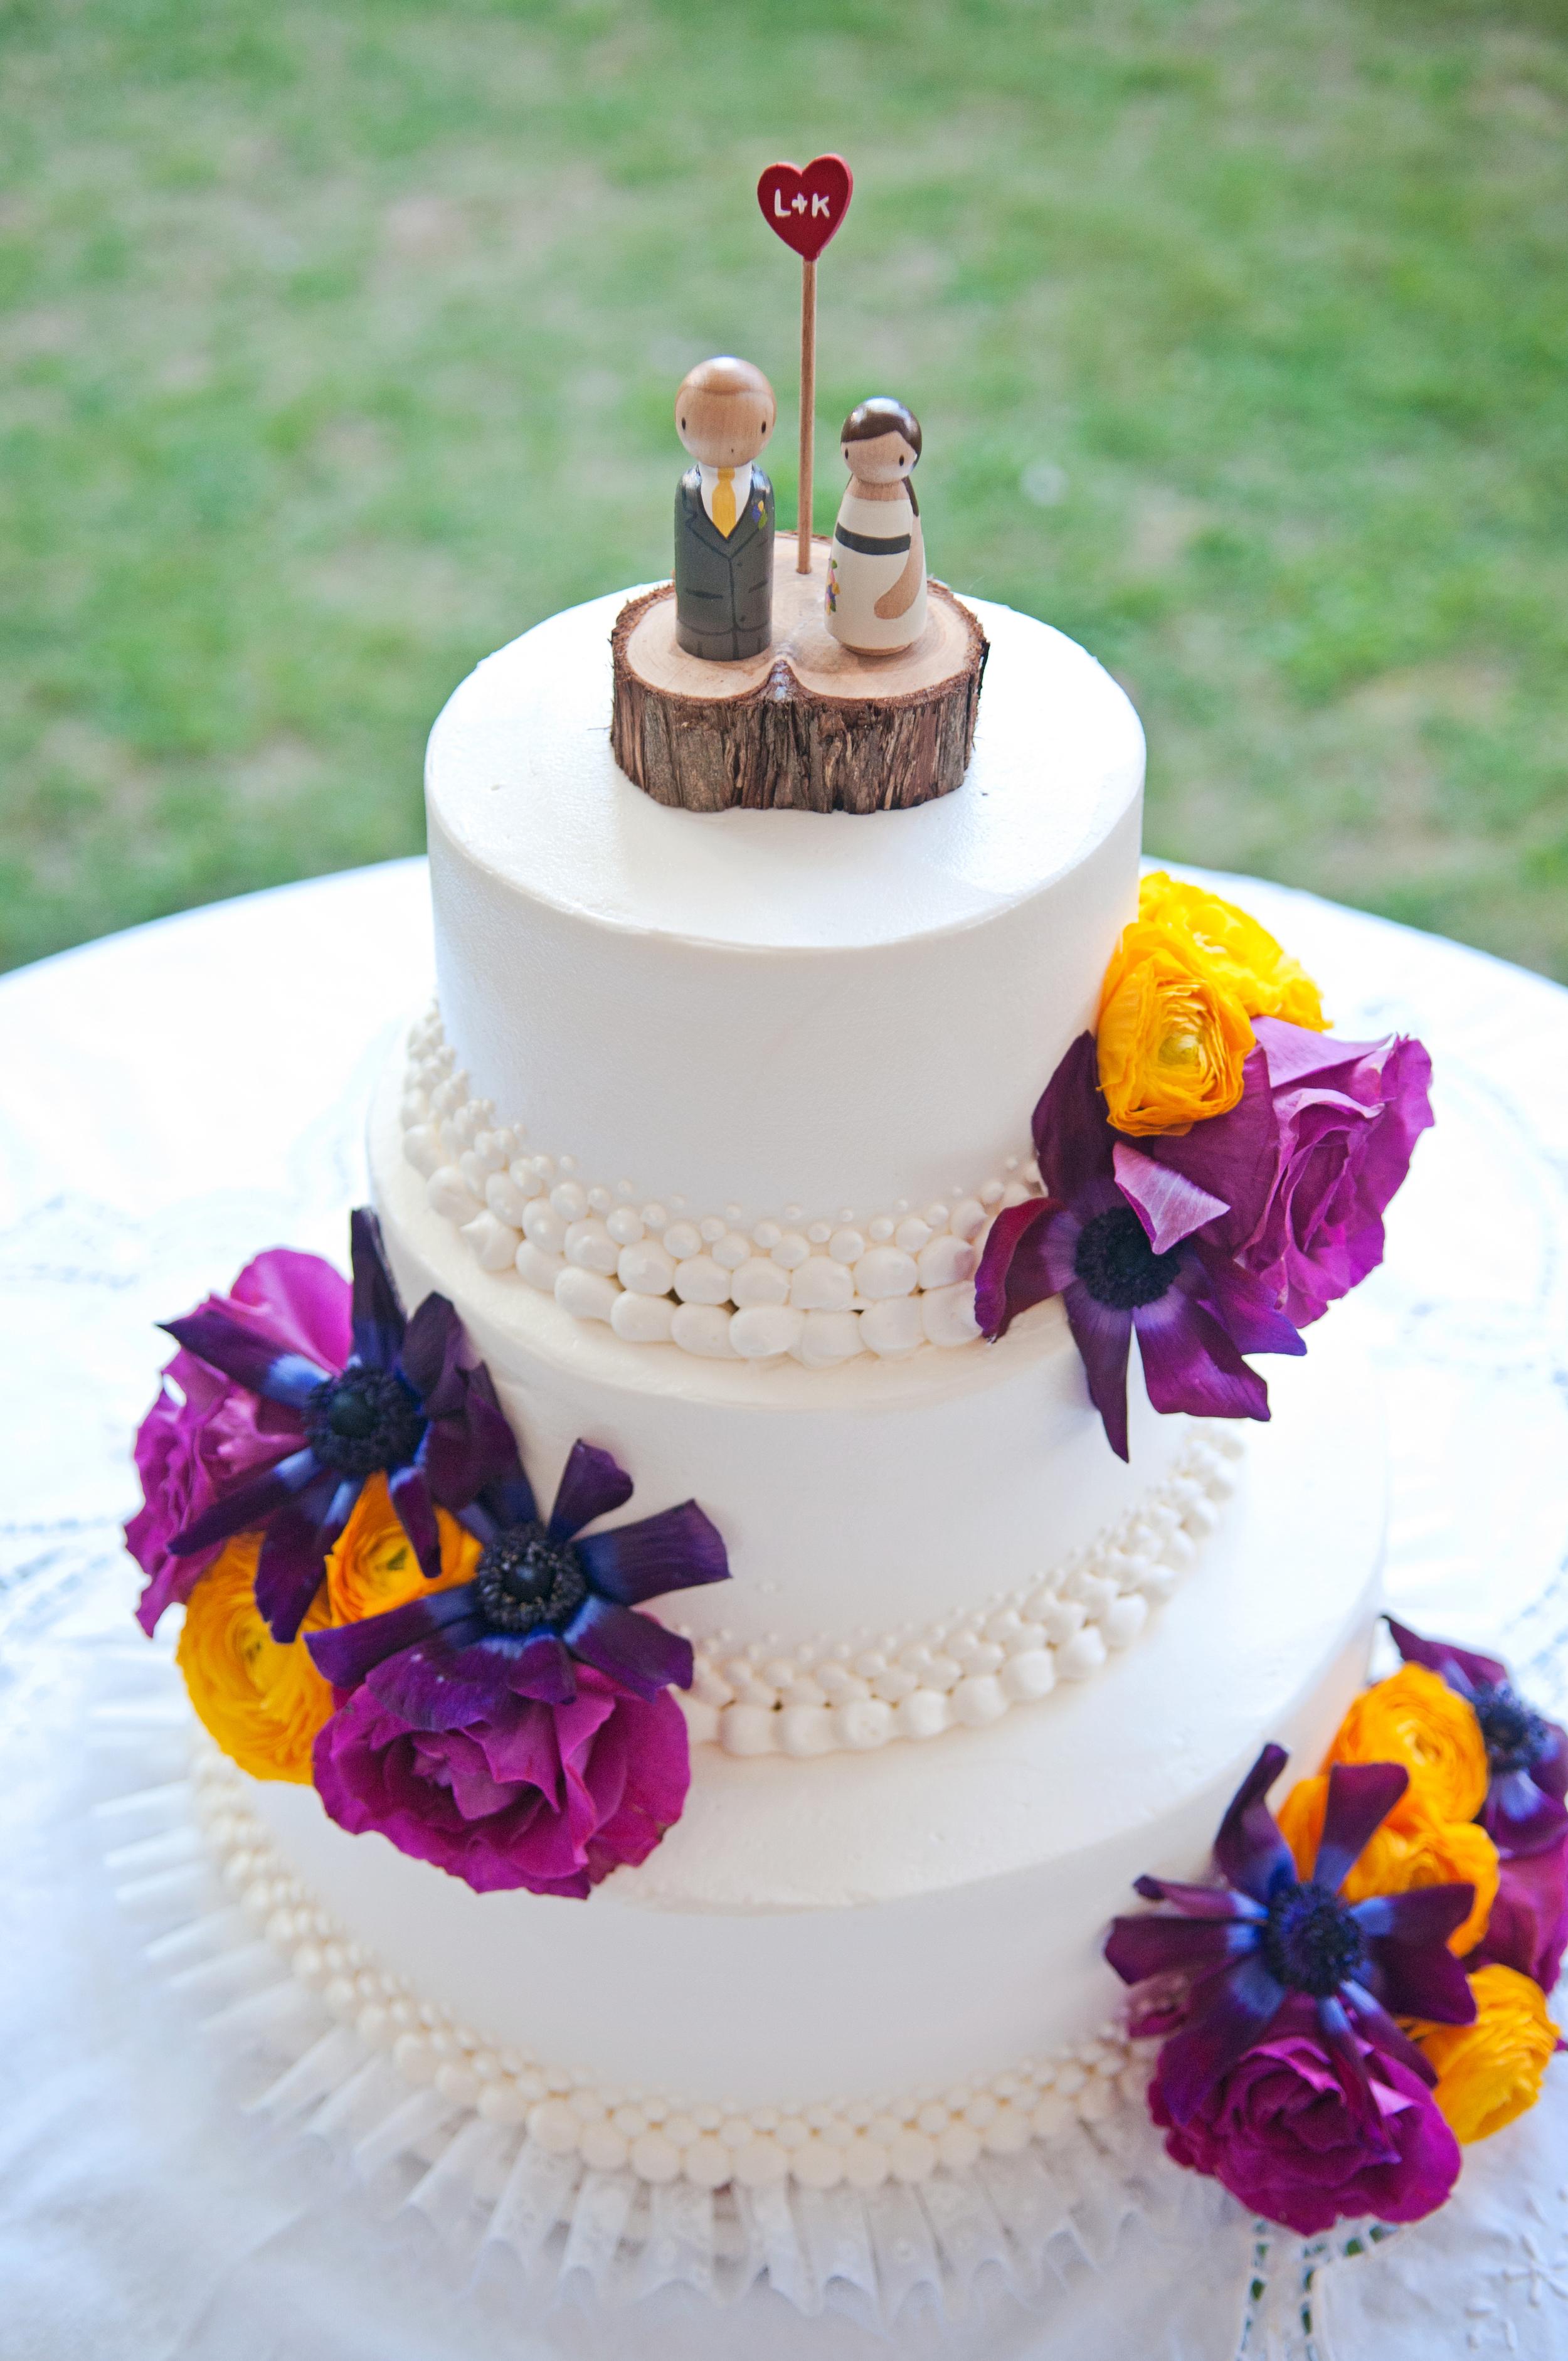 Angela_Chicoski_CT_wedding_photographer_008.jpg